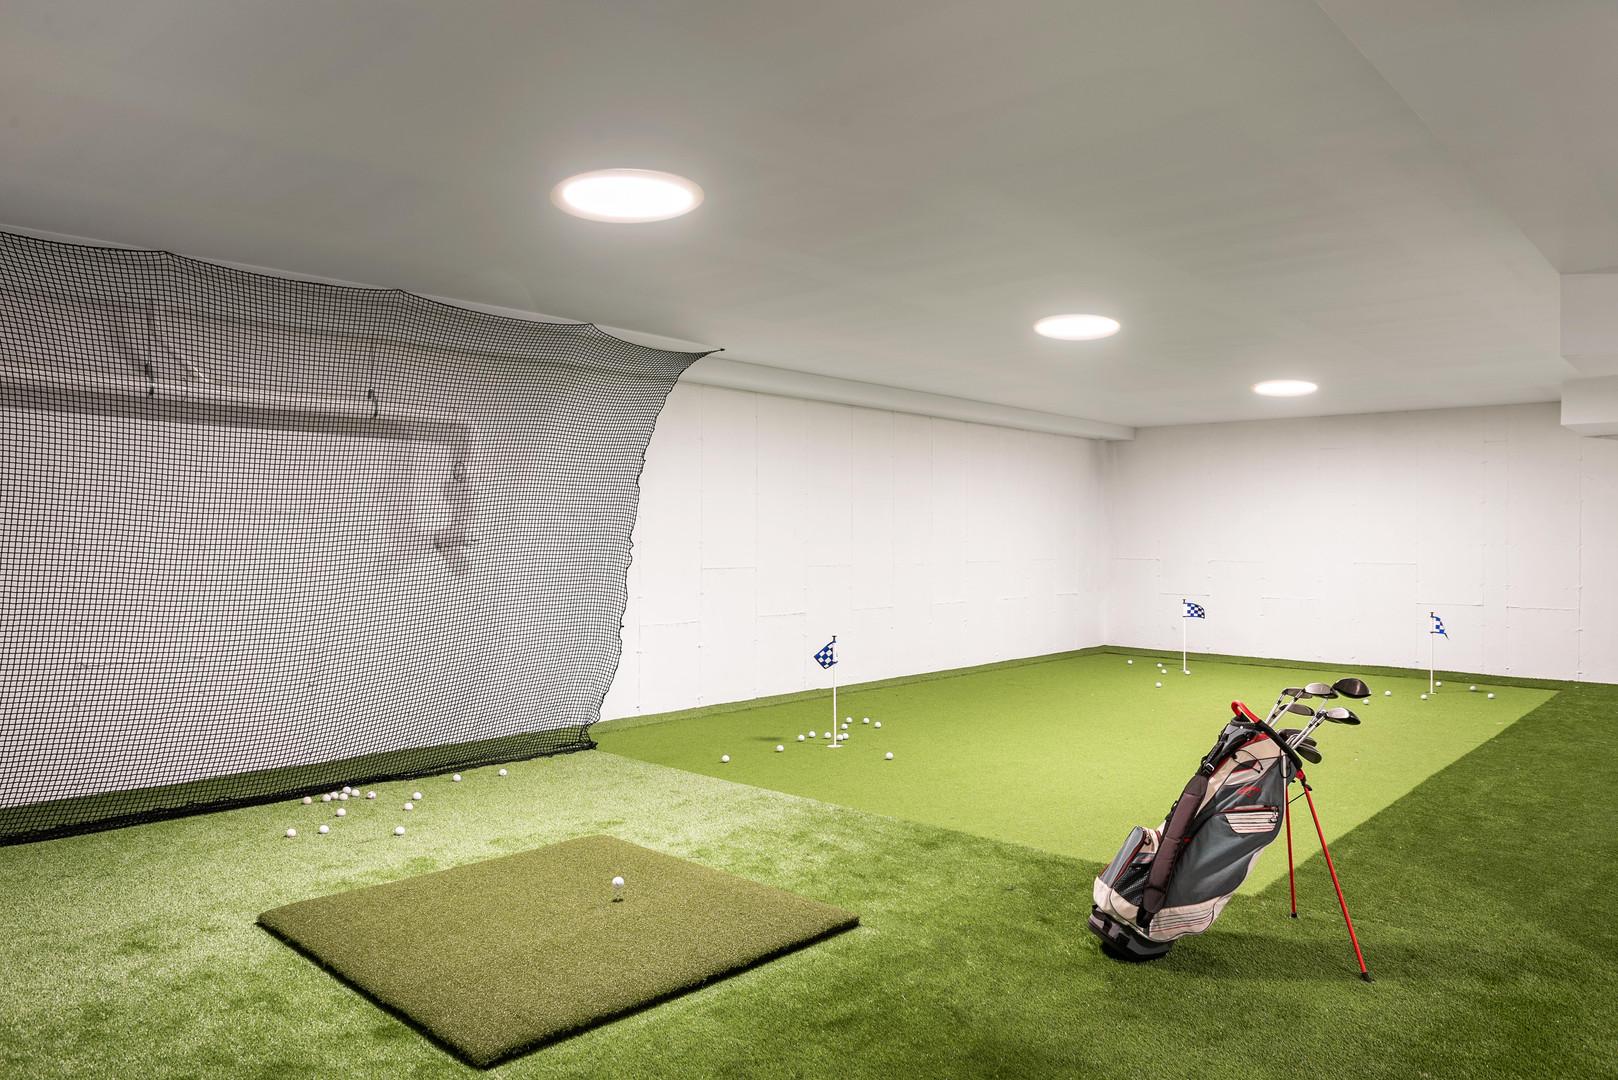 Lower level golf